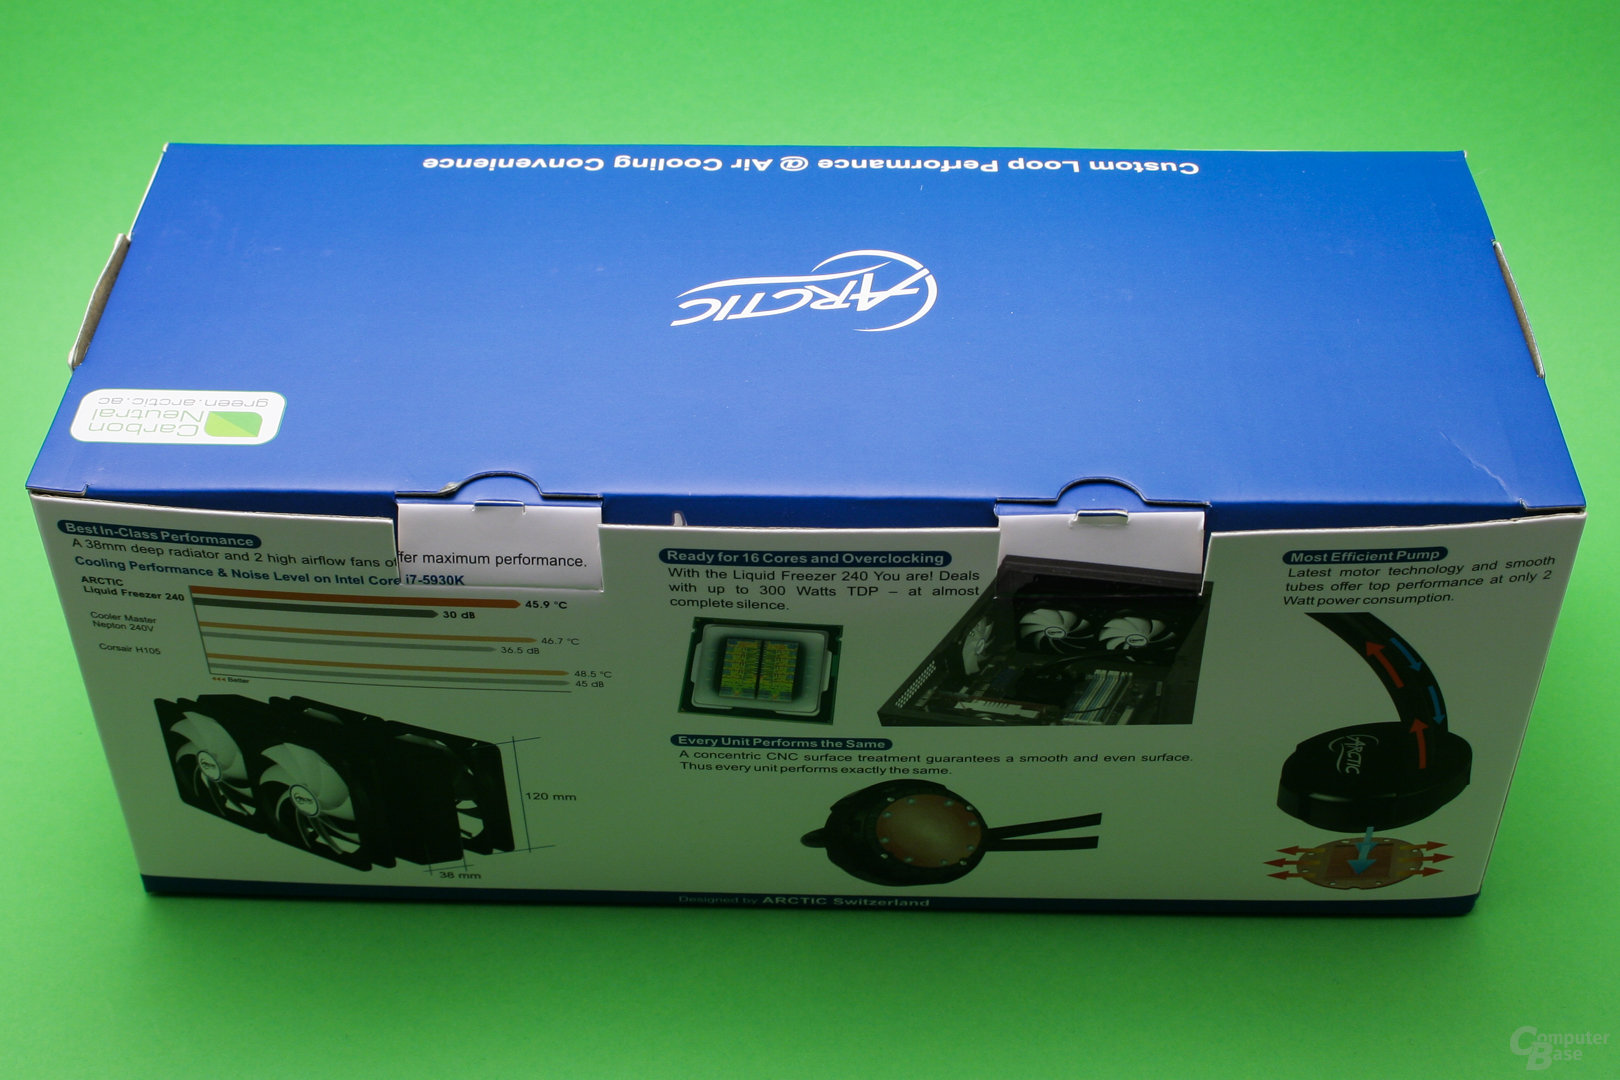 Arctic Liquid Freezer 240: Verpackung ist etwas klein